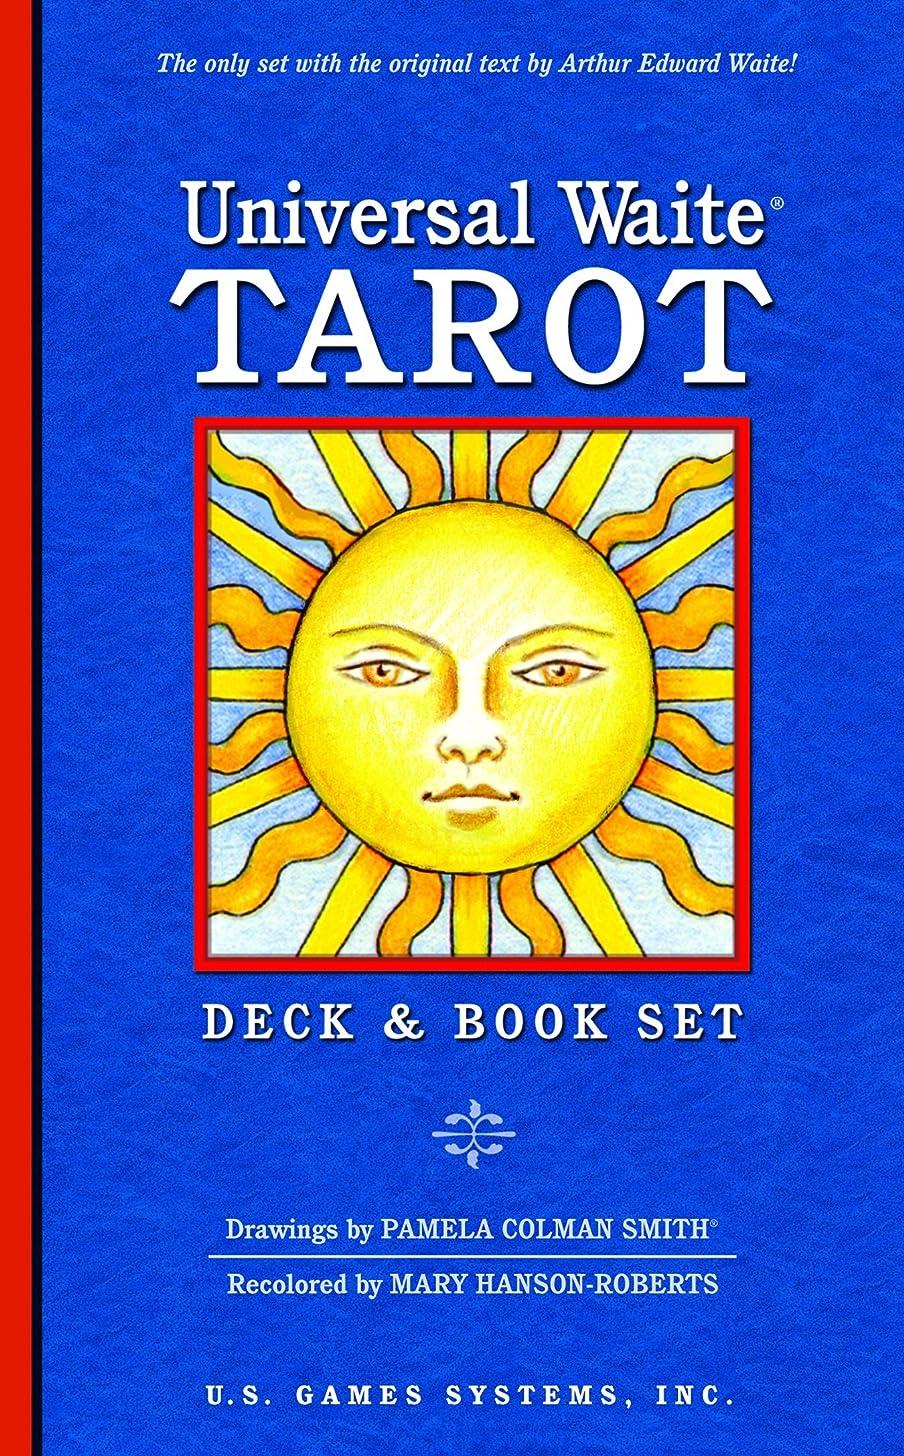 Universal Waite Tarot Deck and Book Set